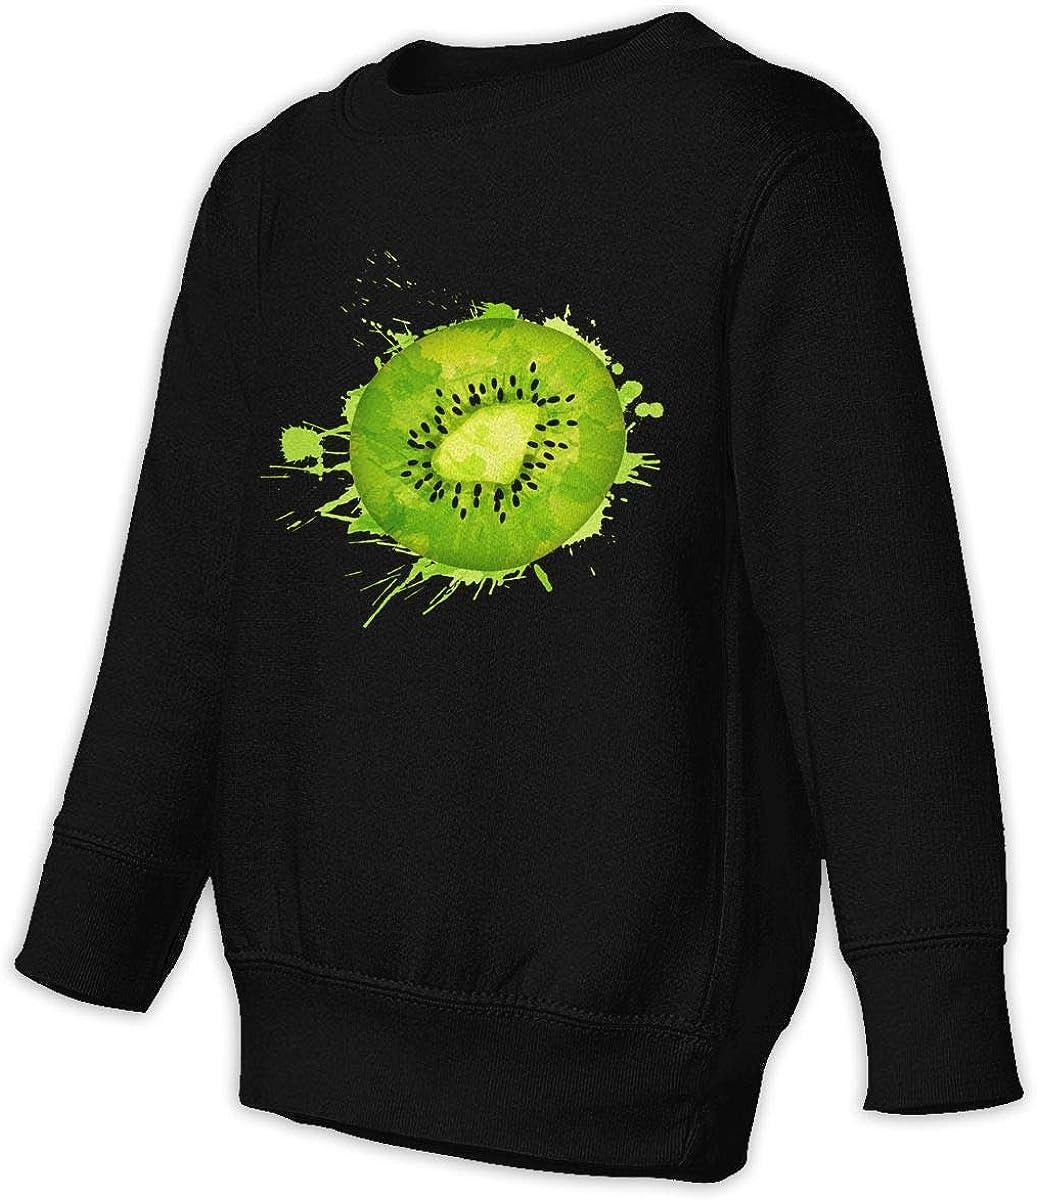 GHYNJUM Kiwi Berry Child Unisex Cotton Long Sleeve Round Neck Pullover